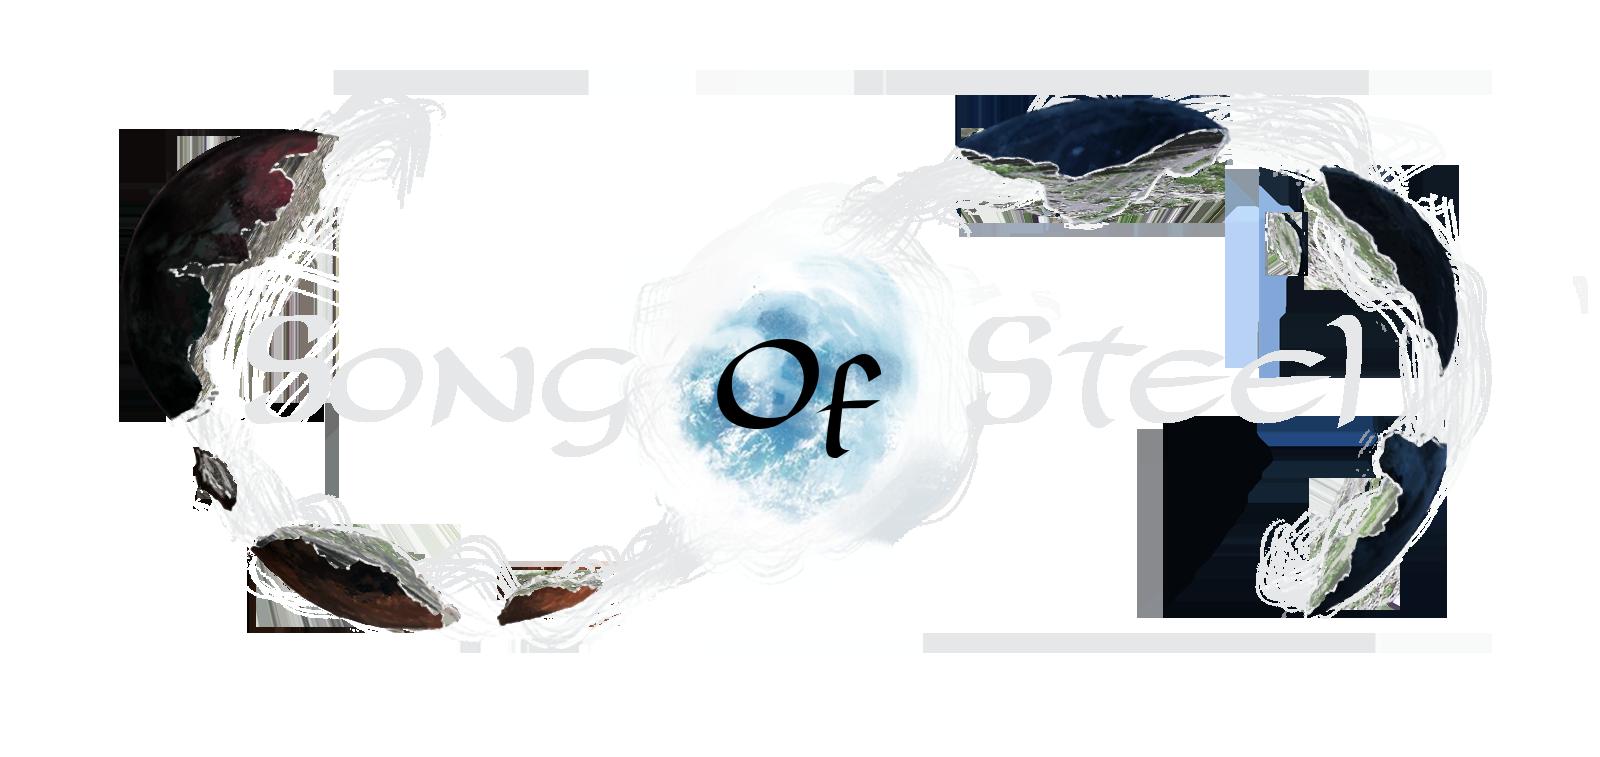 Song of steel